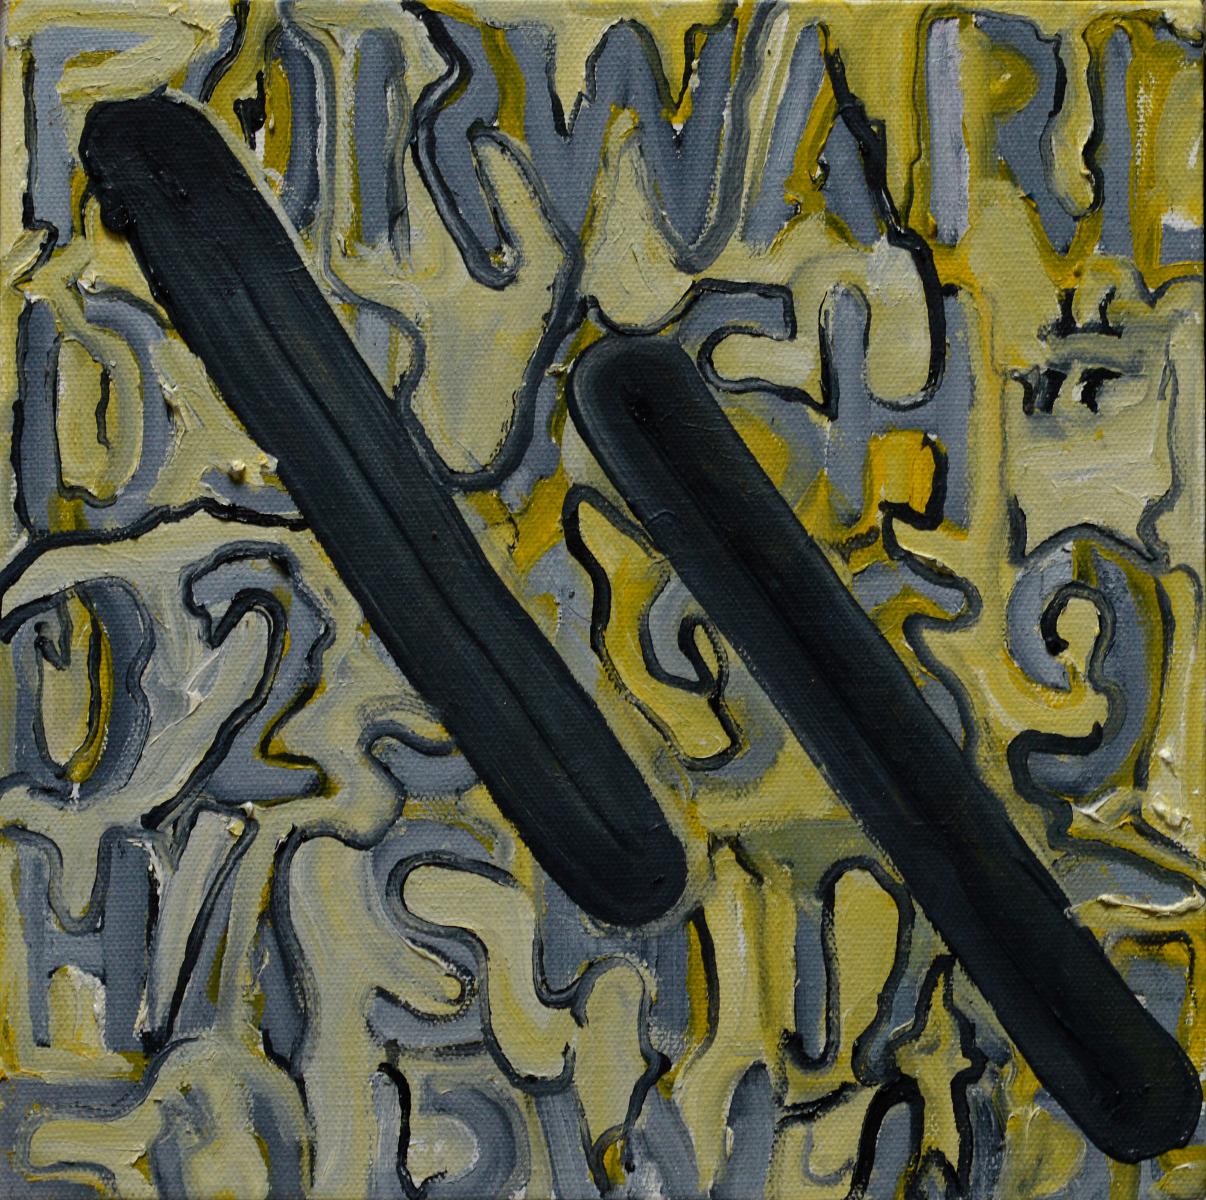 Forward Slash, 30cm x 30cm, oil on canvas